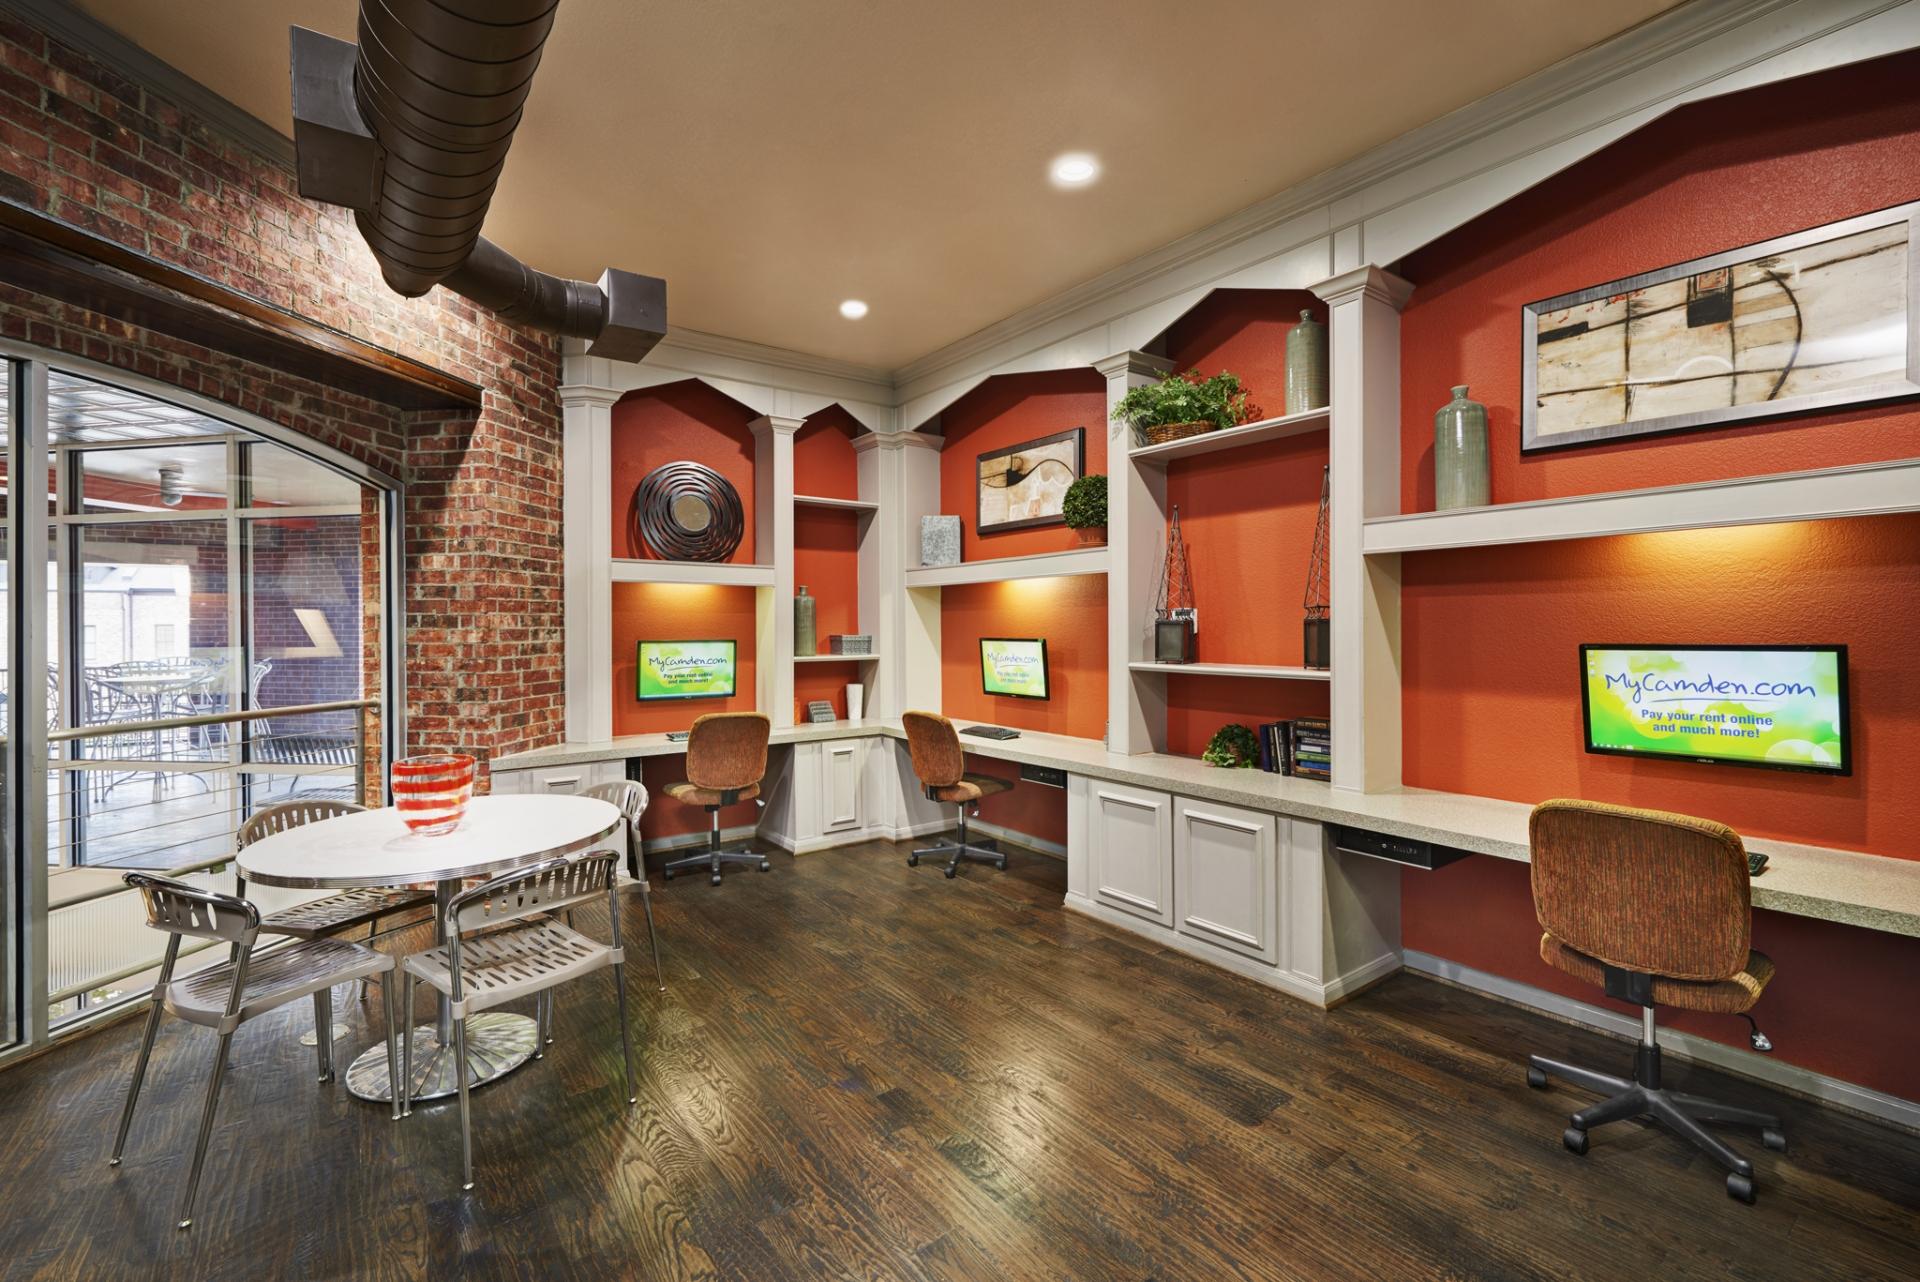 Camden Farmers Market Apartments image 29